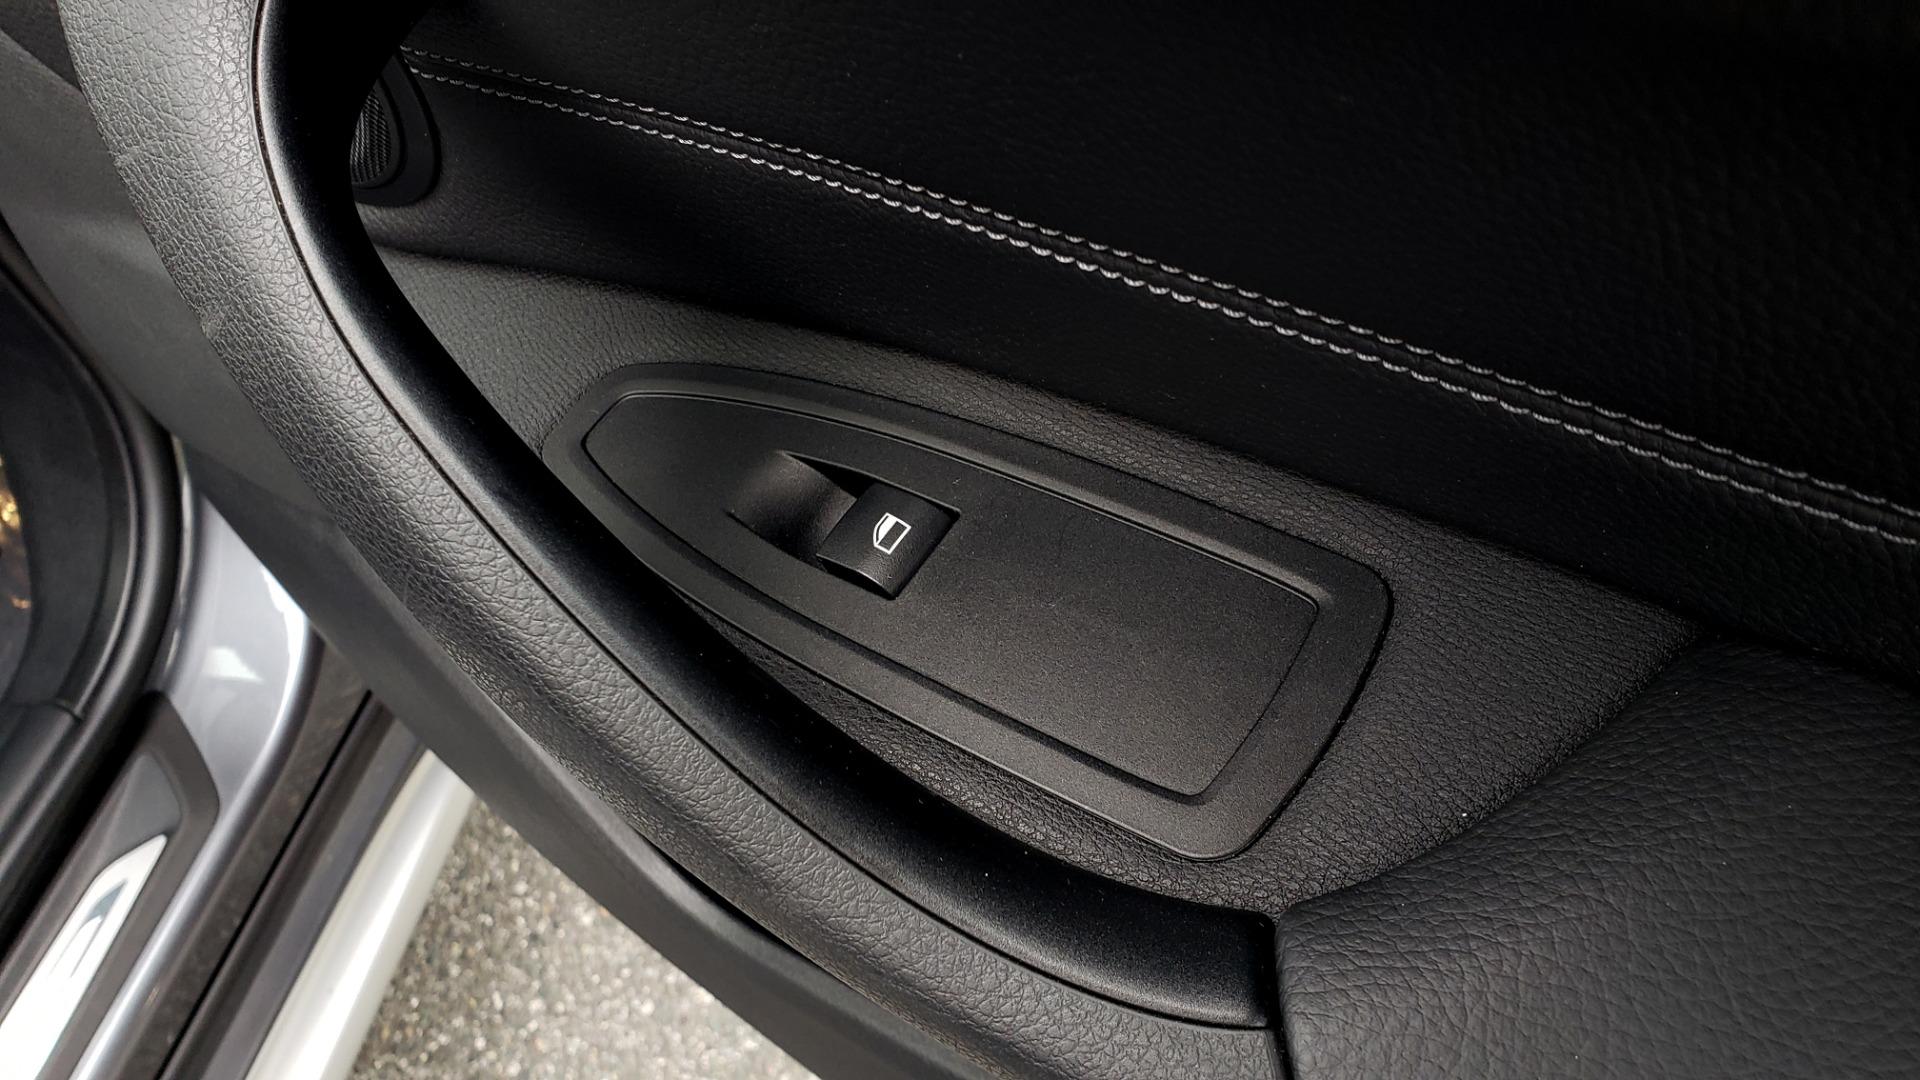 Used 2017 BMW X1 XDRIVE28I / PREM PKG / DRIVER ASST / NAV / CLD WTHR for sale Sold at Formula Imports in Charlotte NC 28227 67